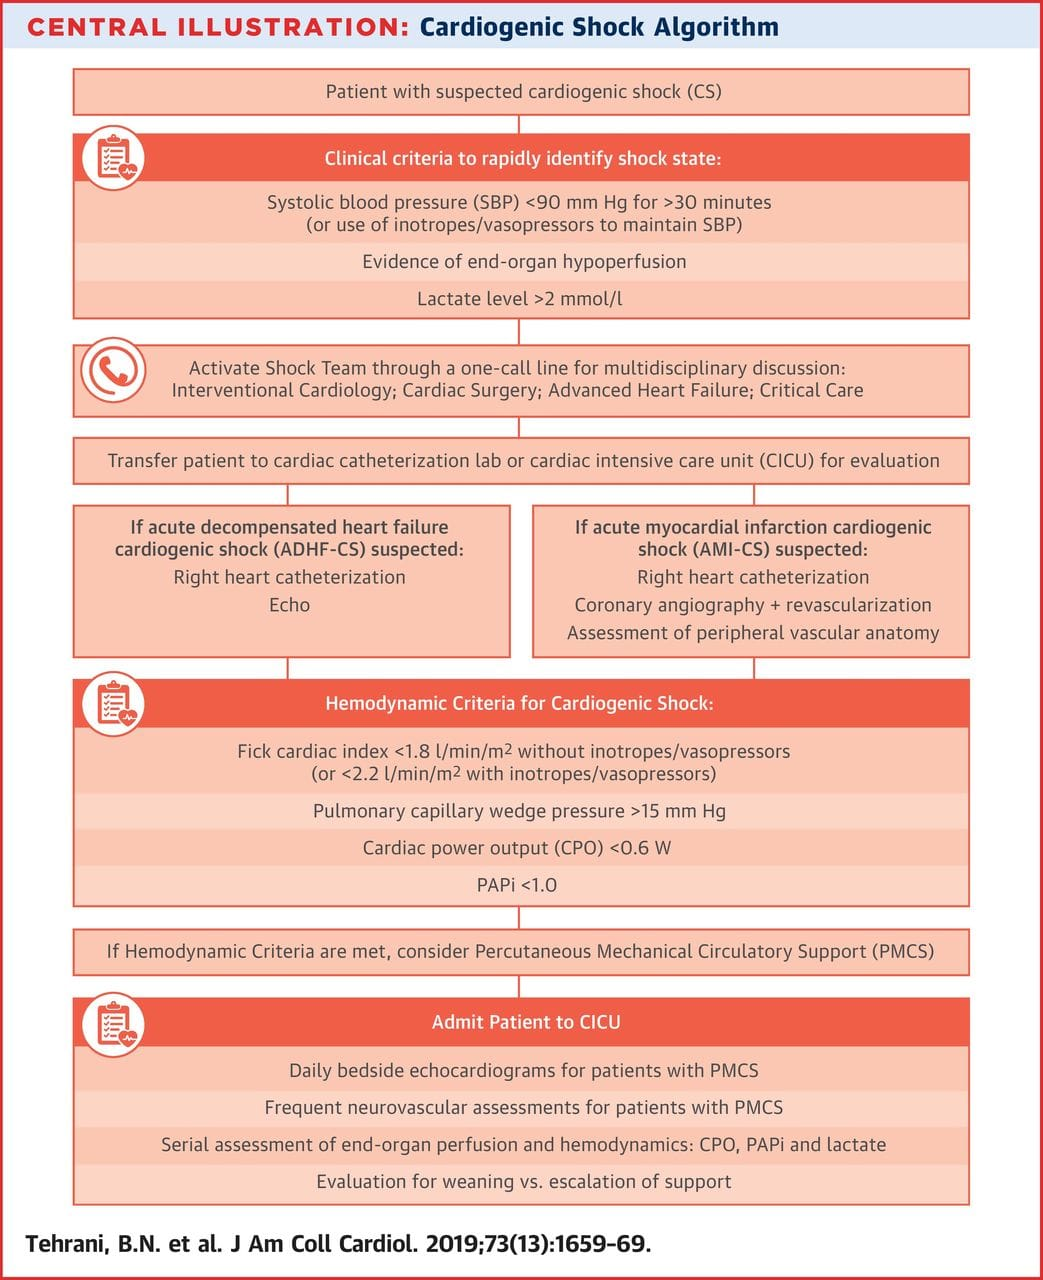 Cardiogenic shock algorhytm